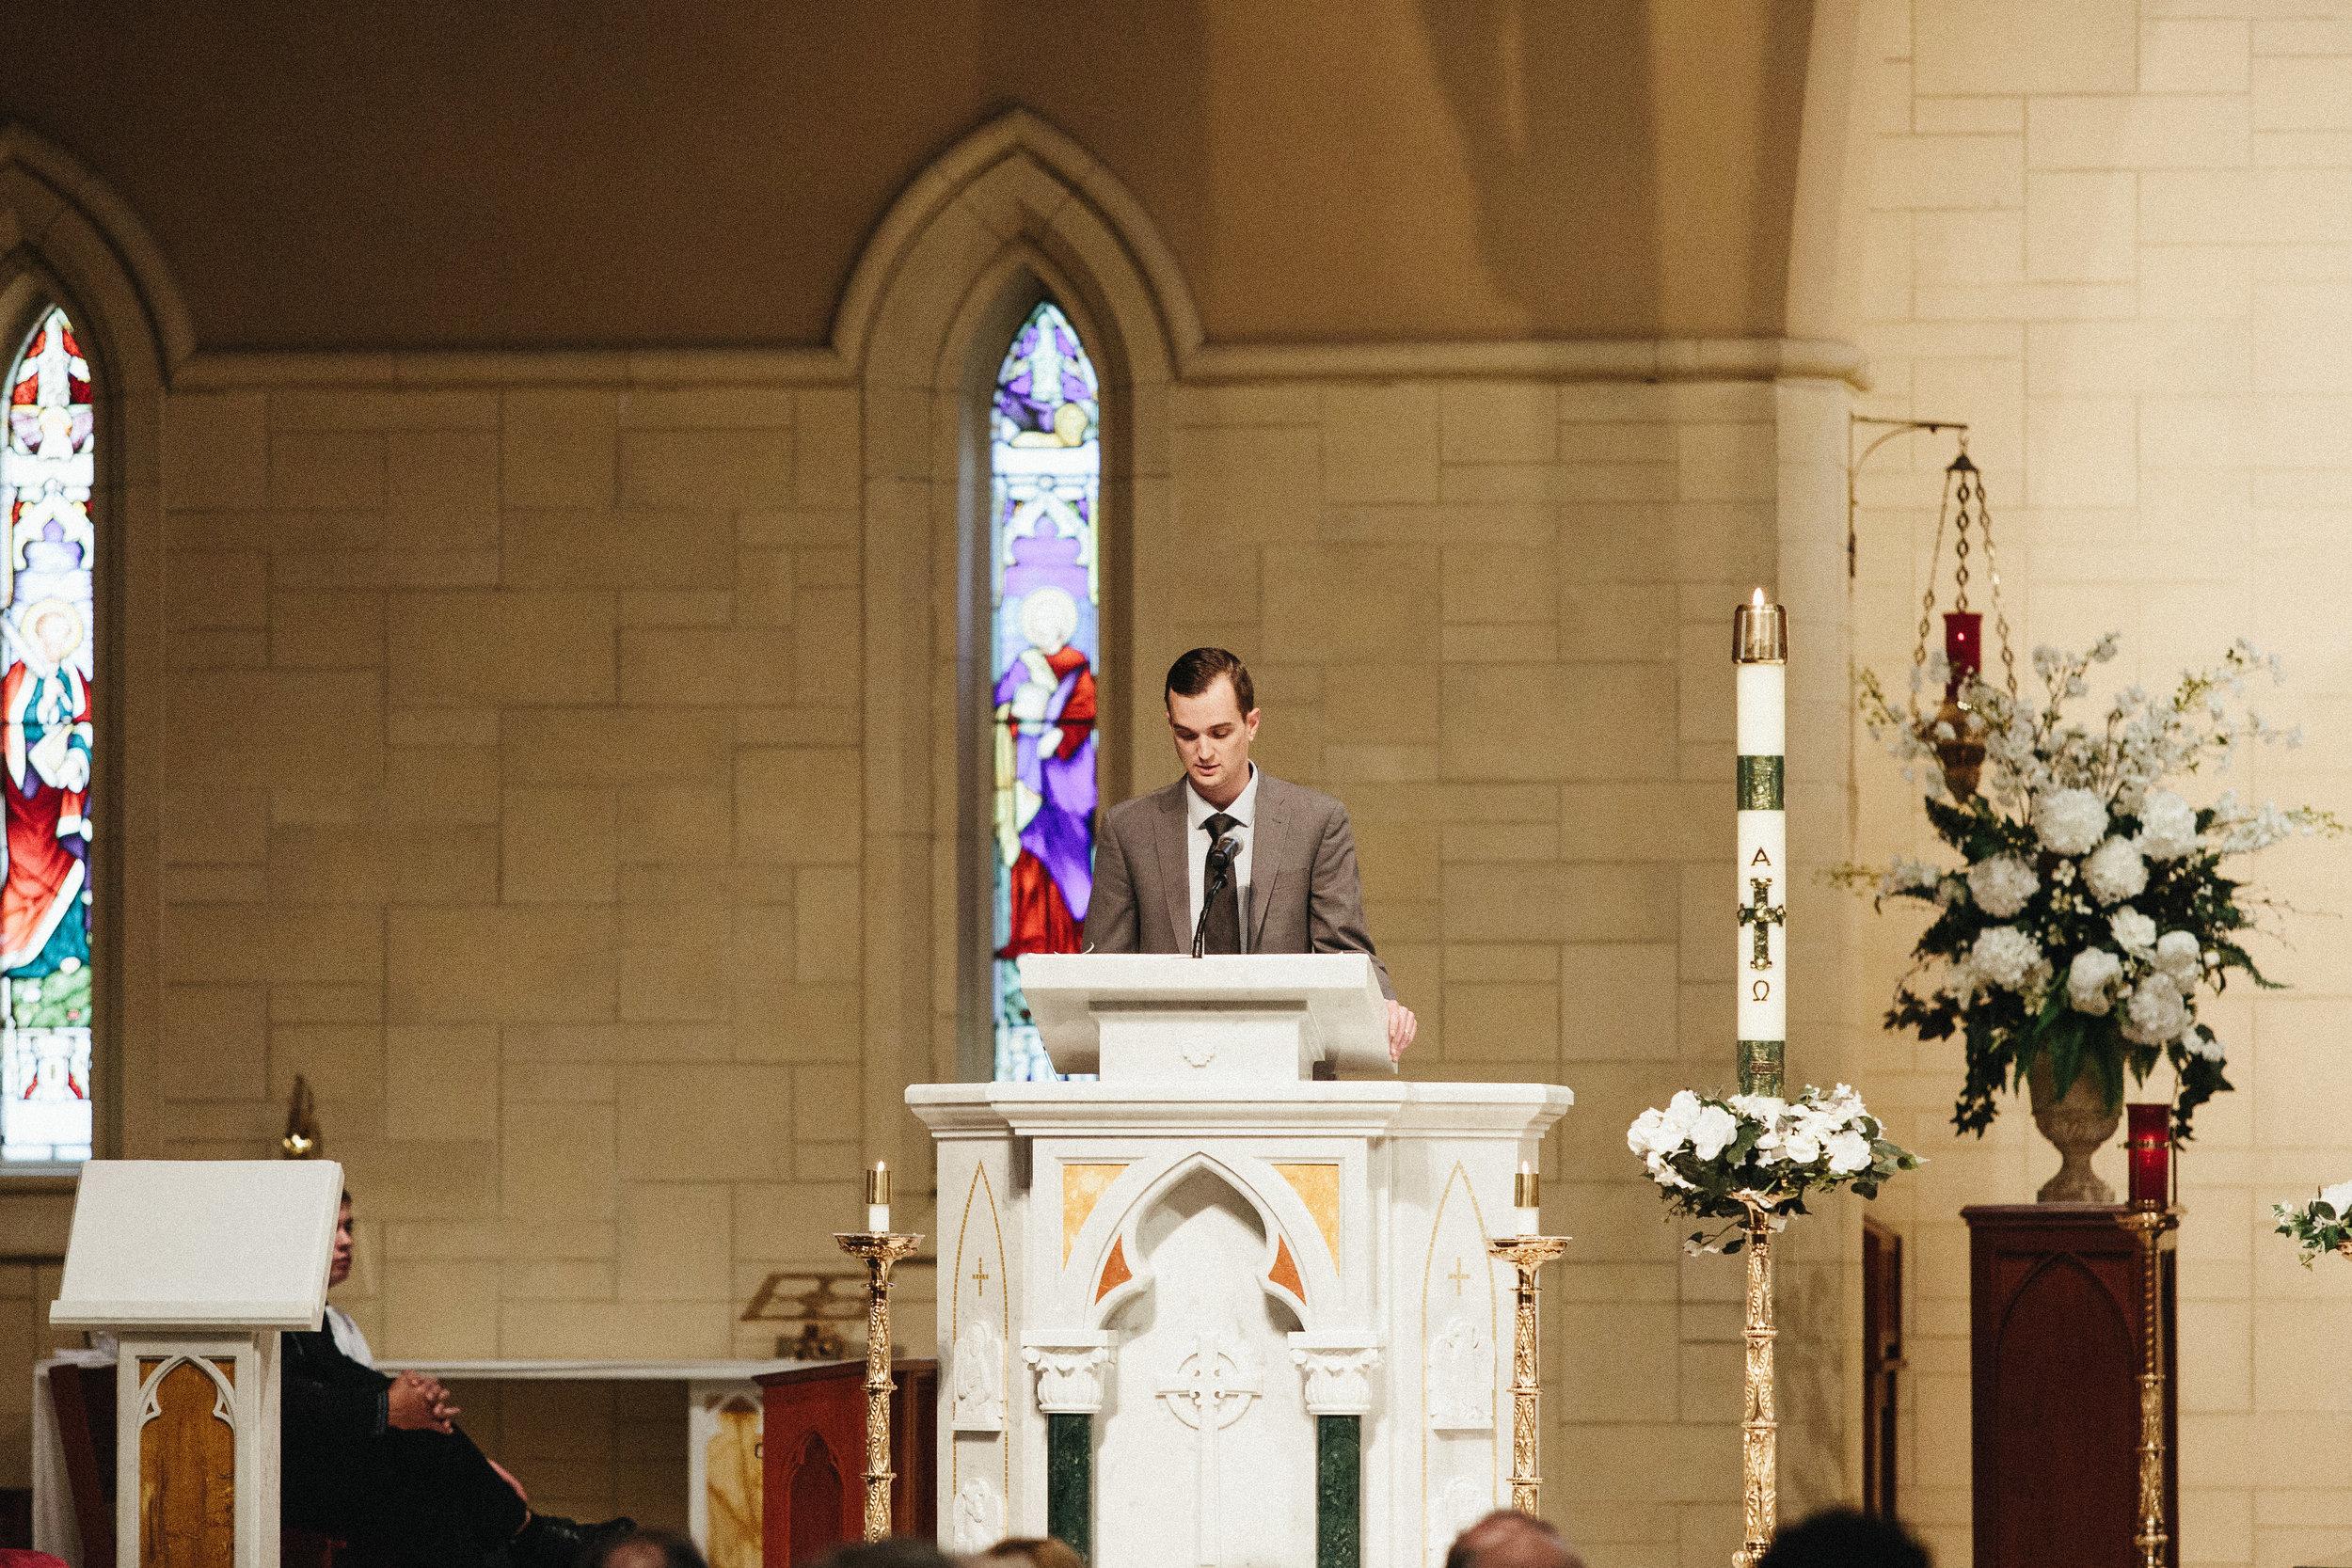 roswell_st_peter_chanel_catholic_avalon_hotel_alpharetta_wedding-1482.jpg